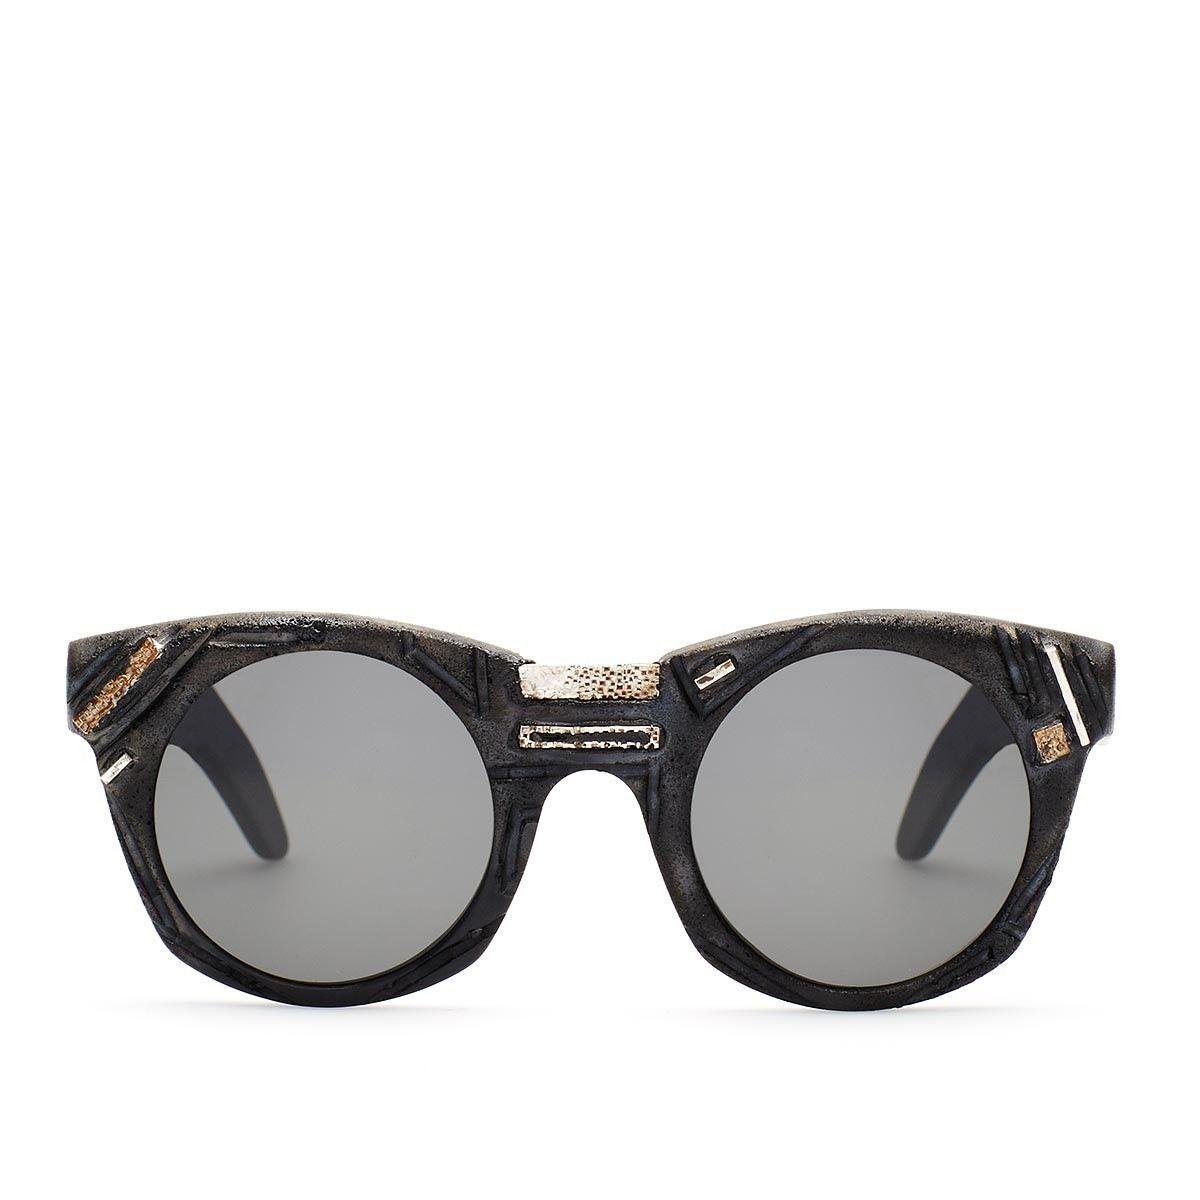 U6 Bm Bt Sunglasses From Kuboraum Collection Sunglasses Mens Accessories Square Sunglass